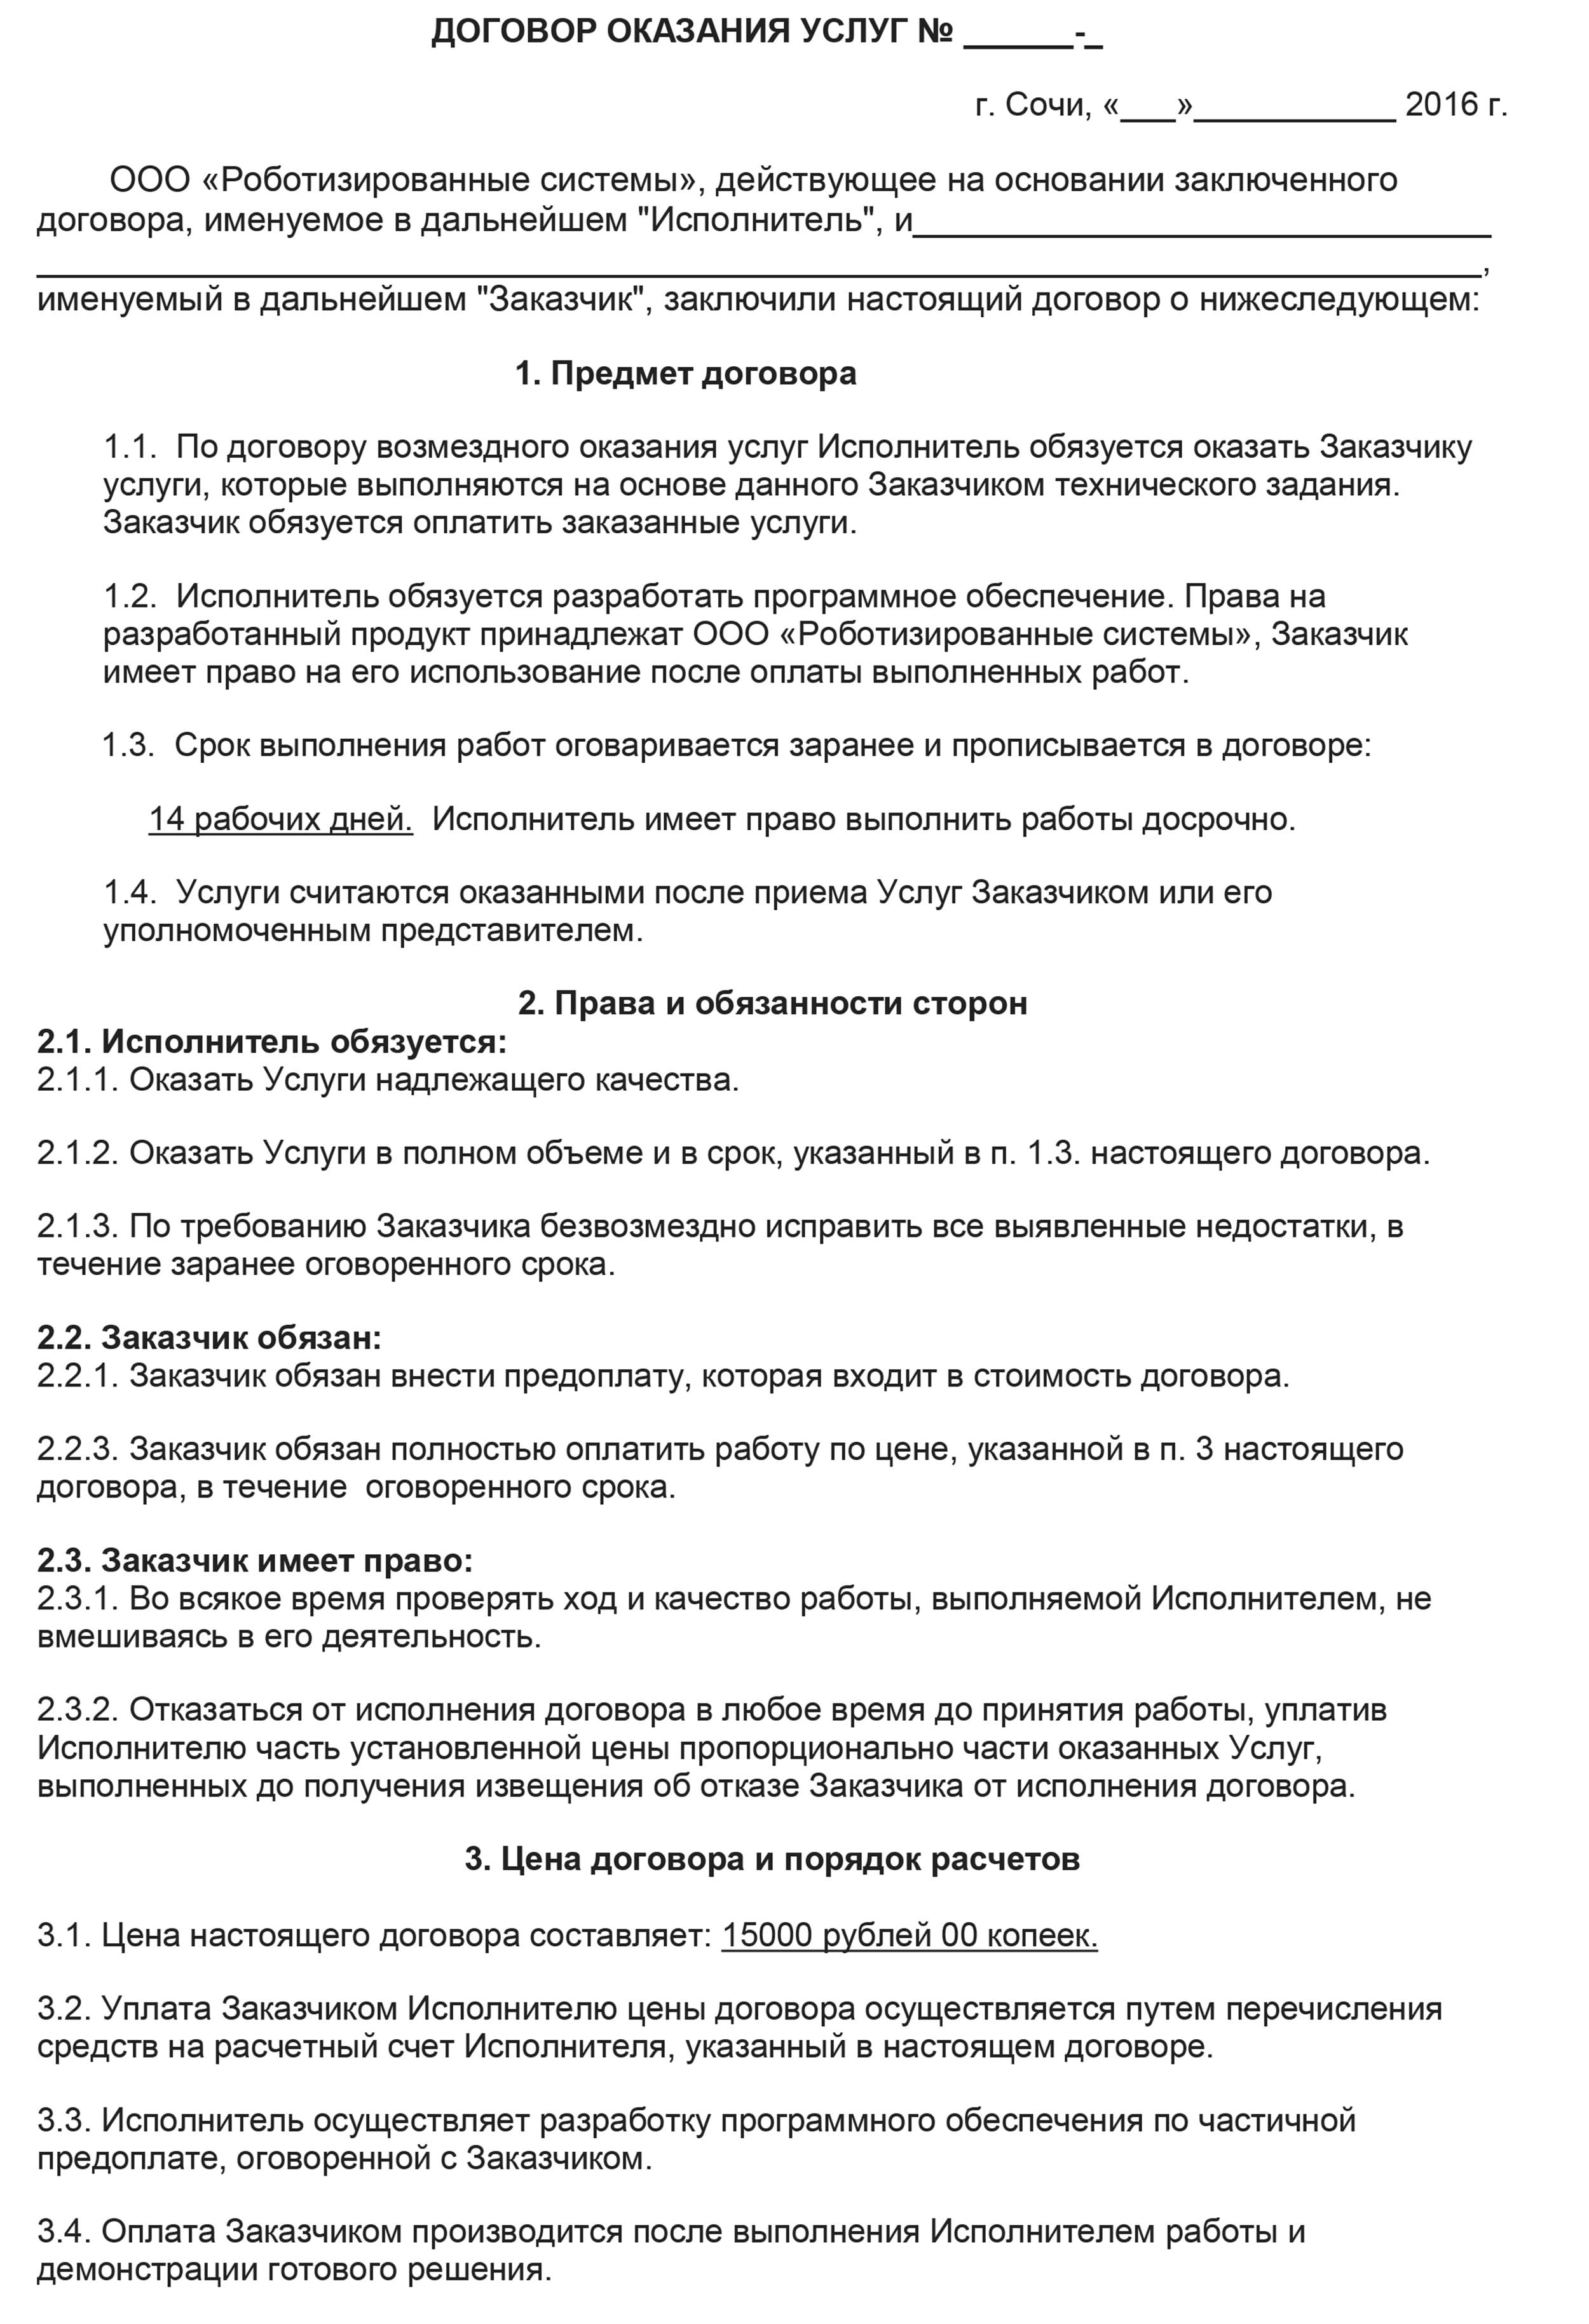 firma de opțiuni binare)